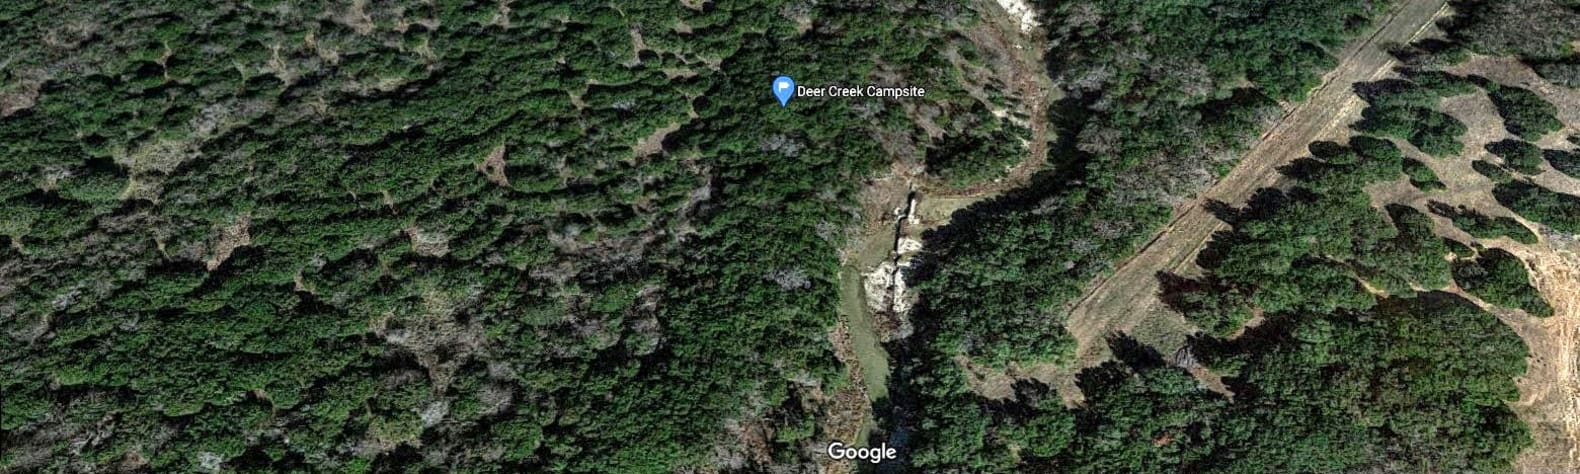 DeerCreek Campground